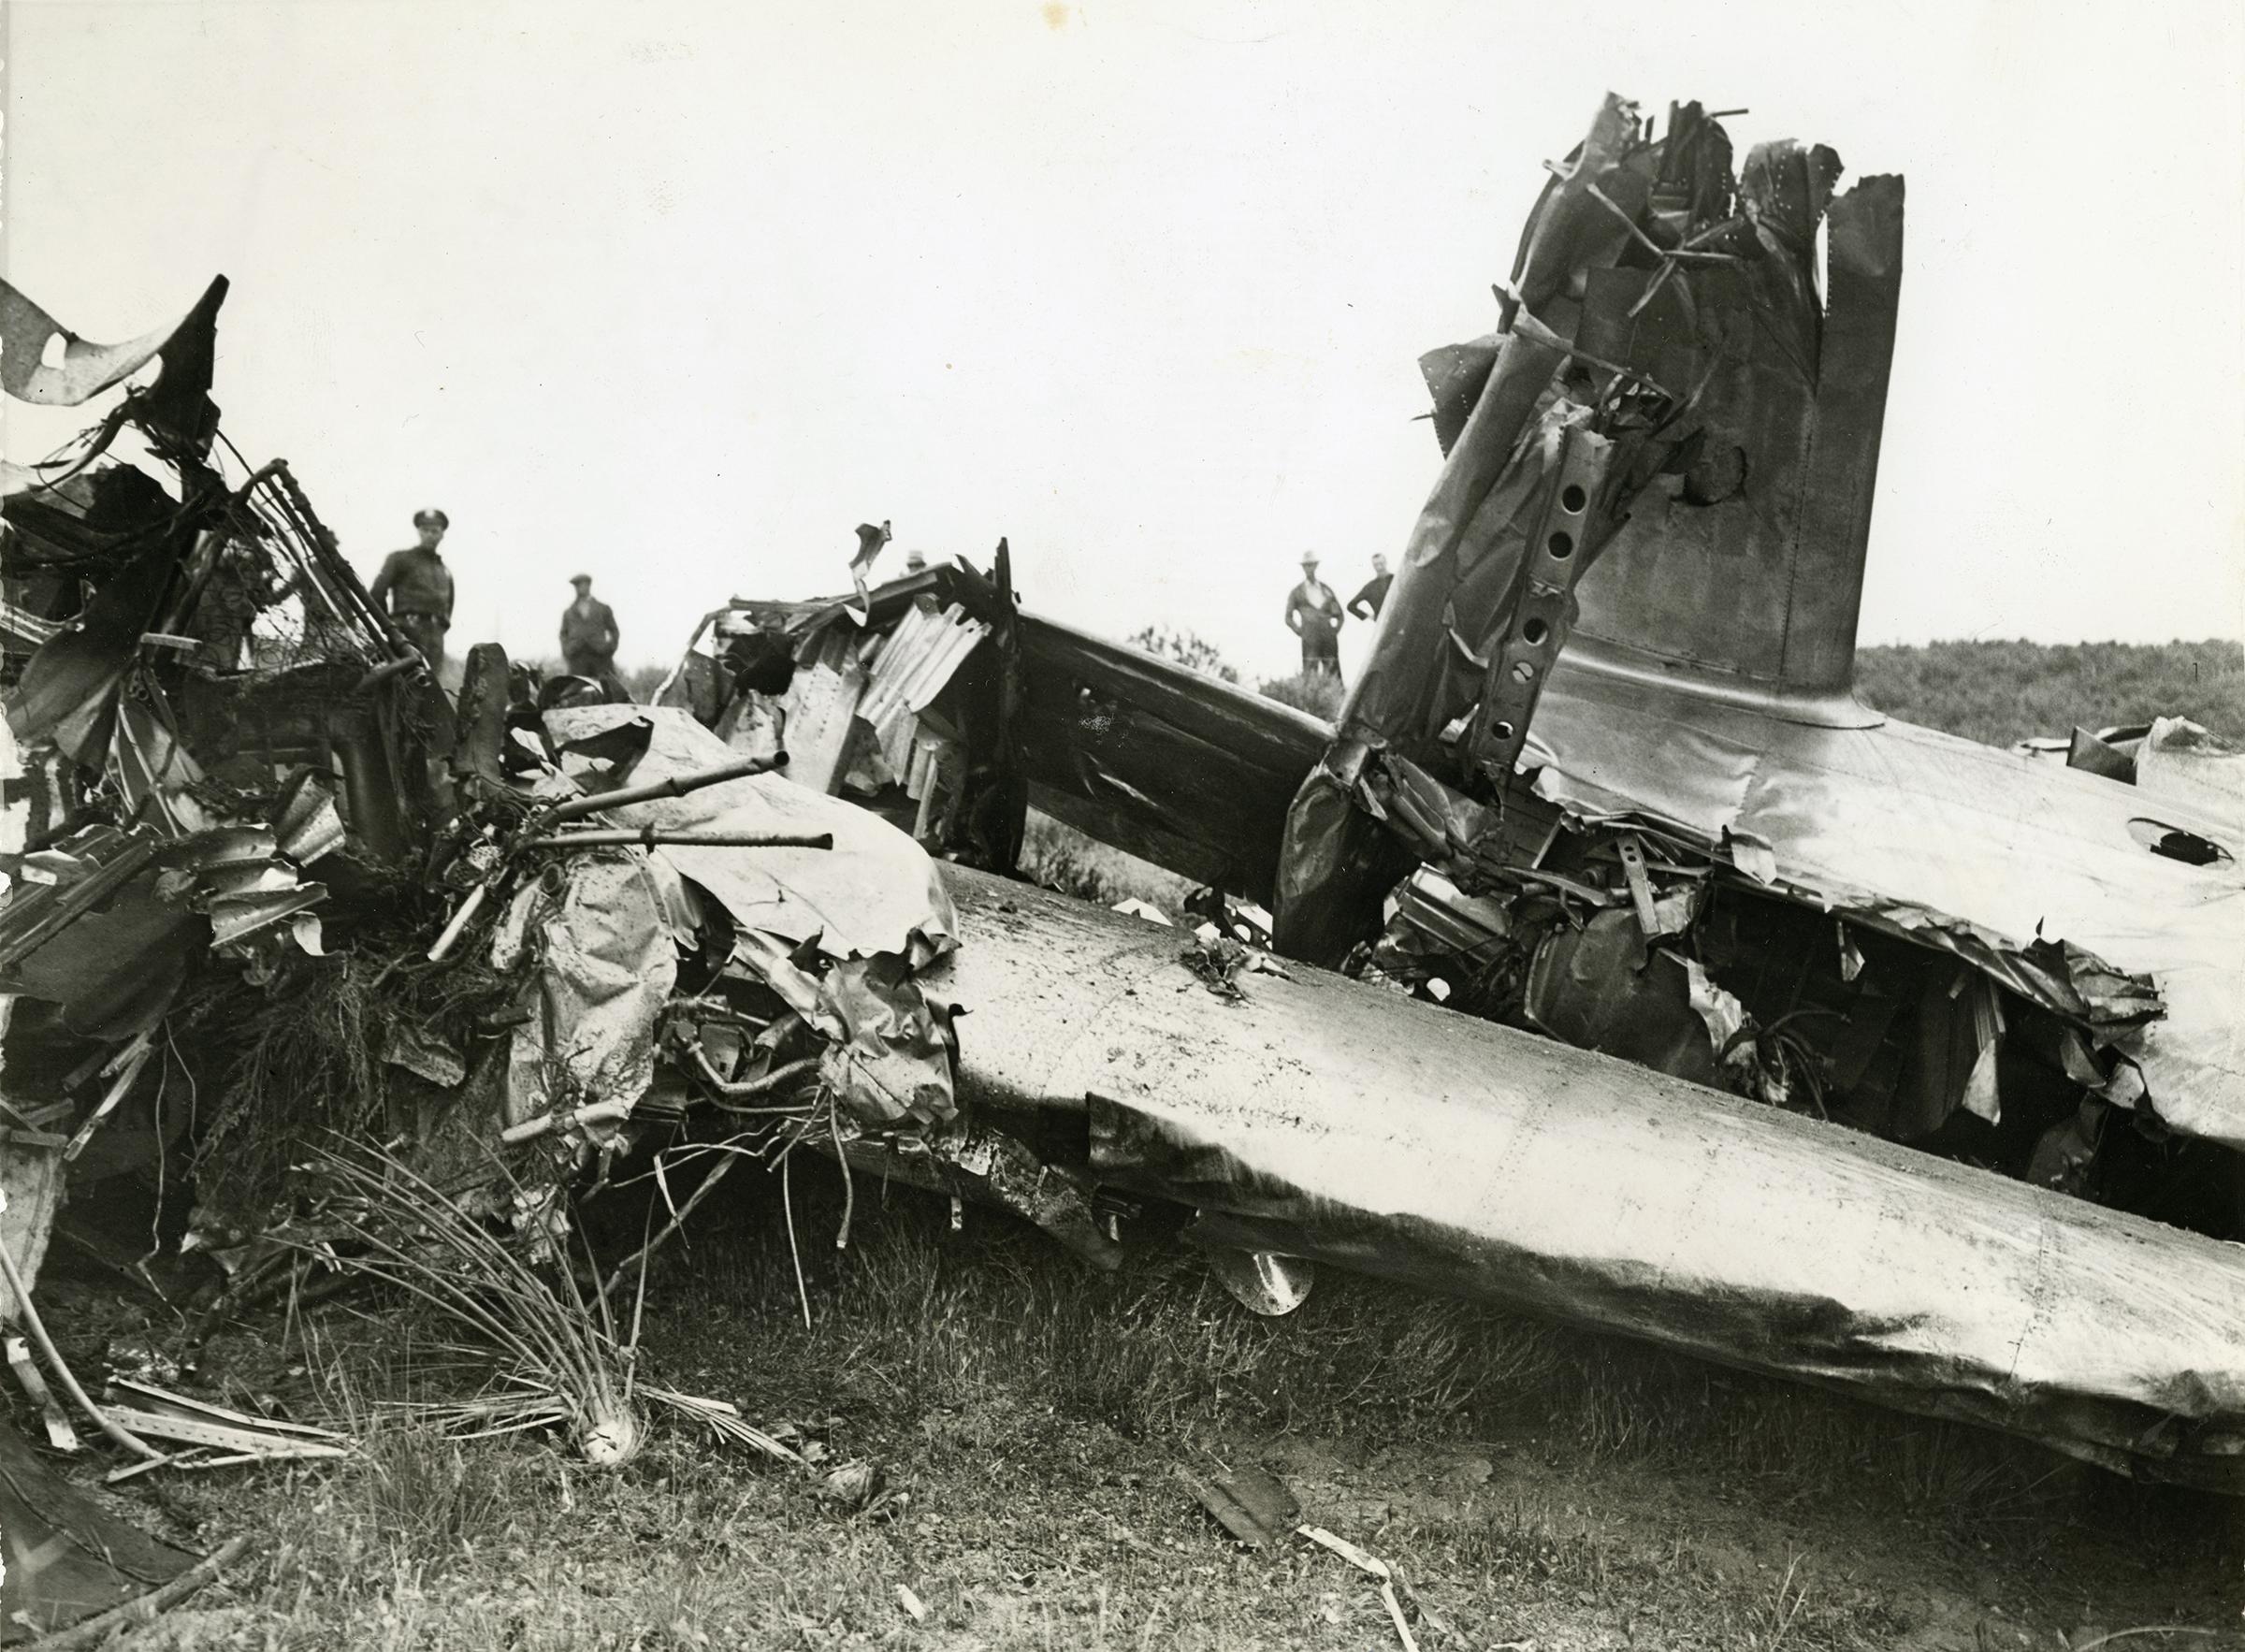 scvhistorycom lw2877 aircraft down wreckage of